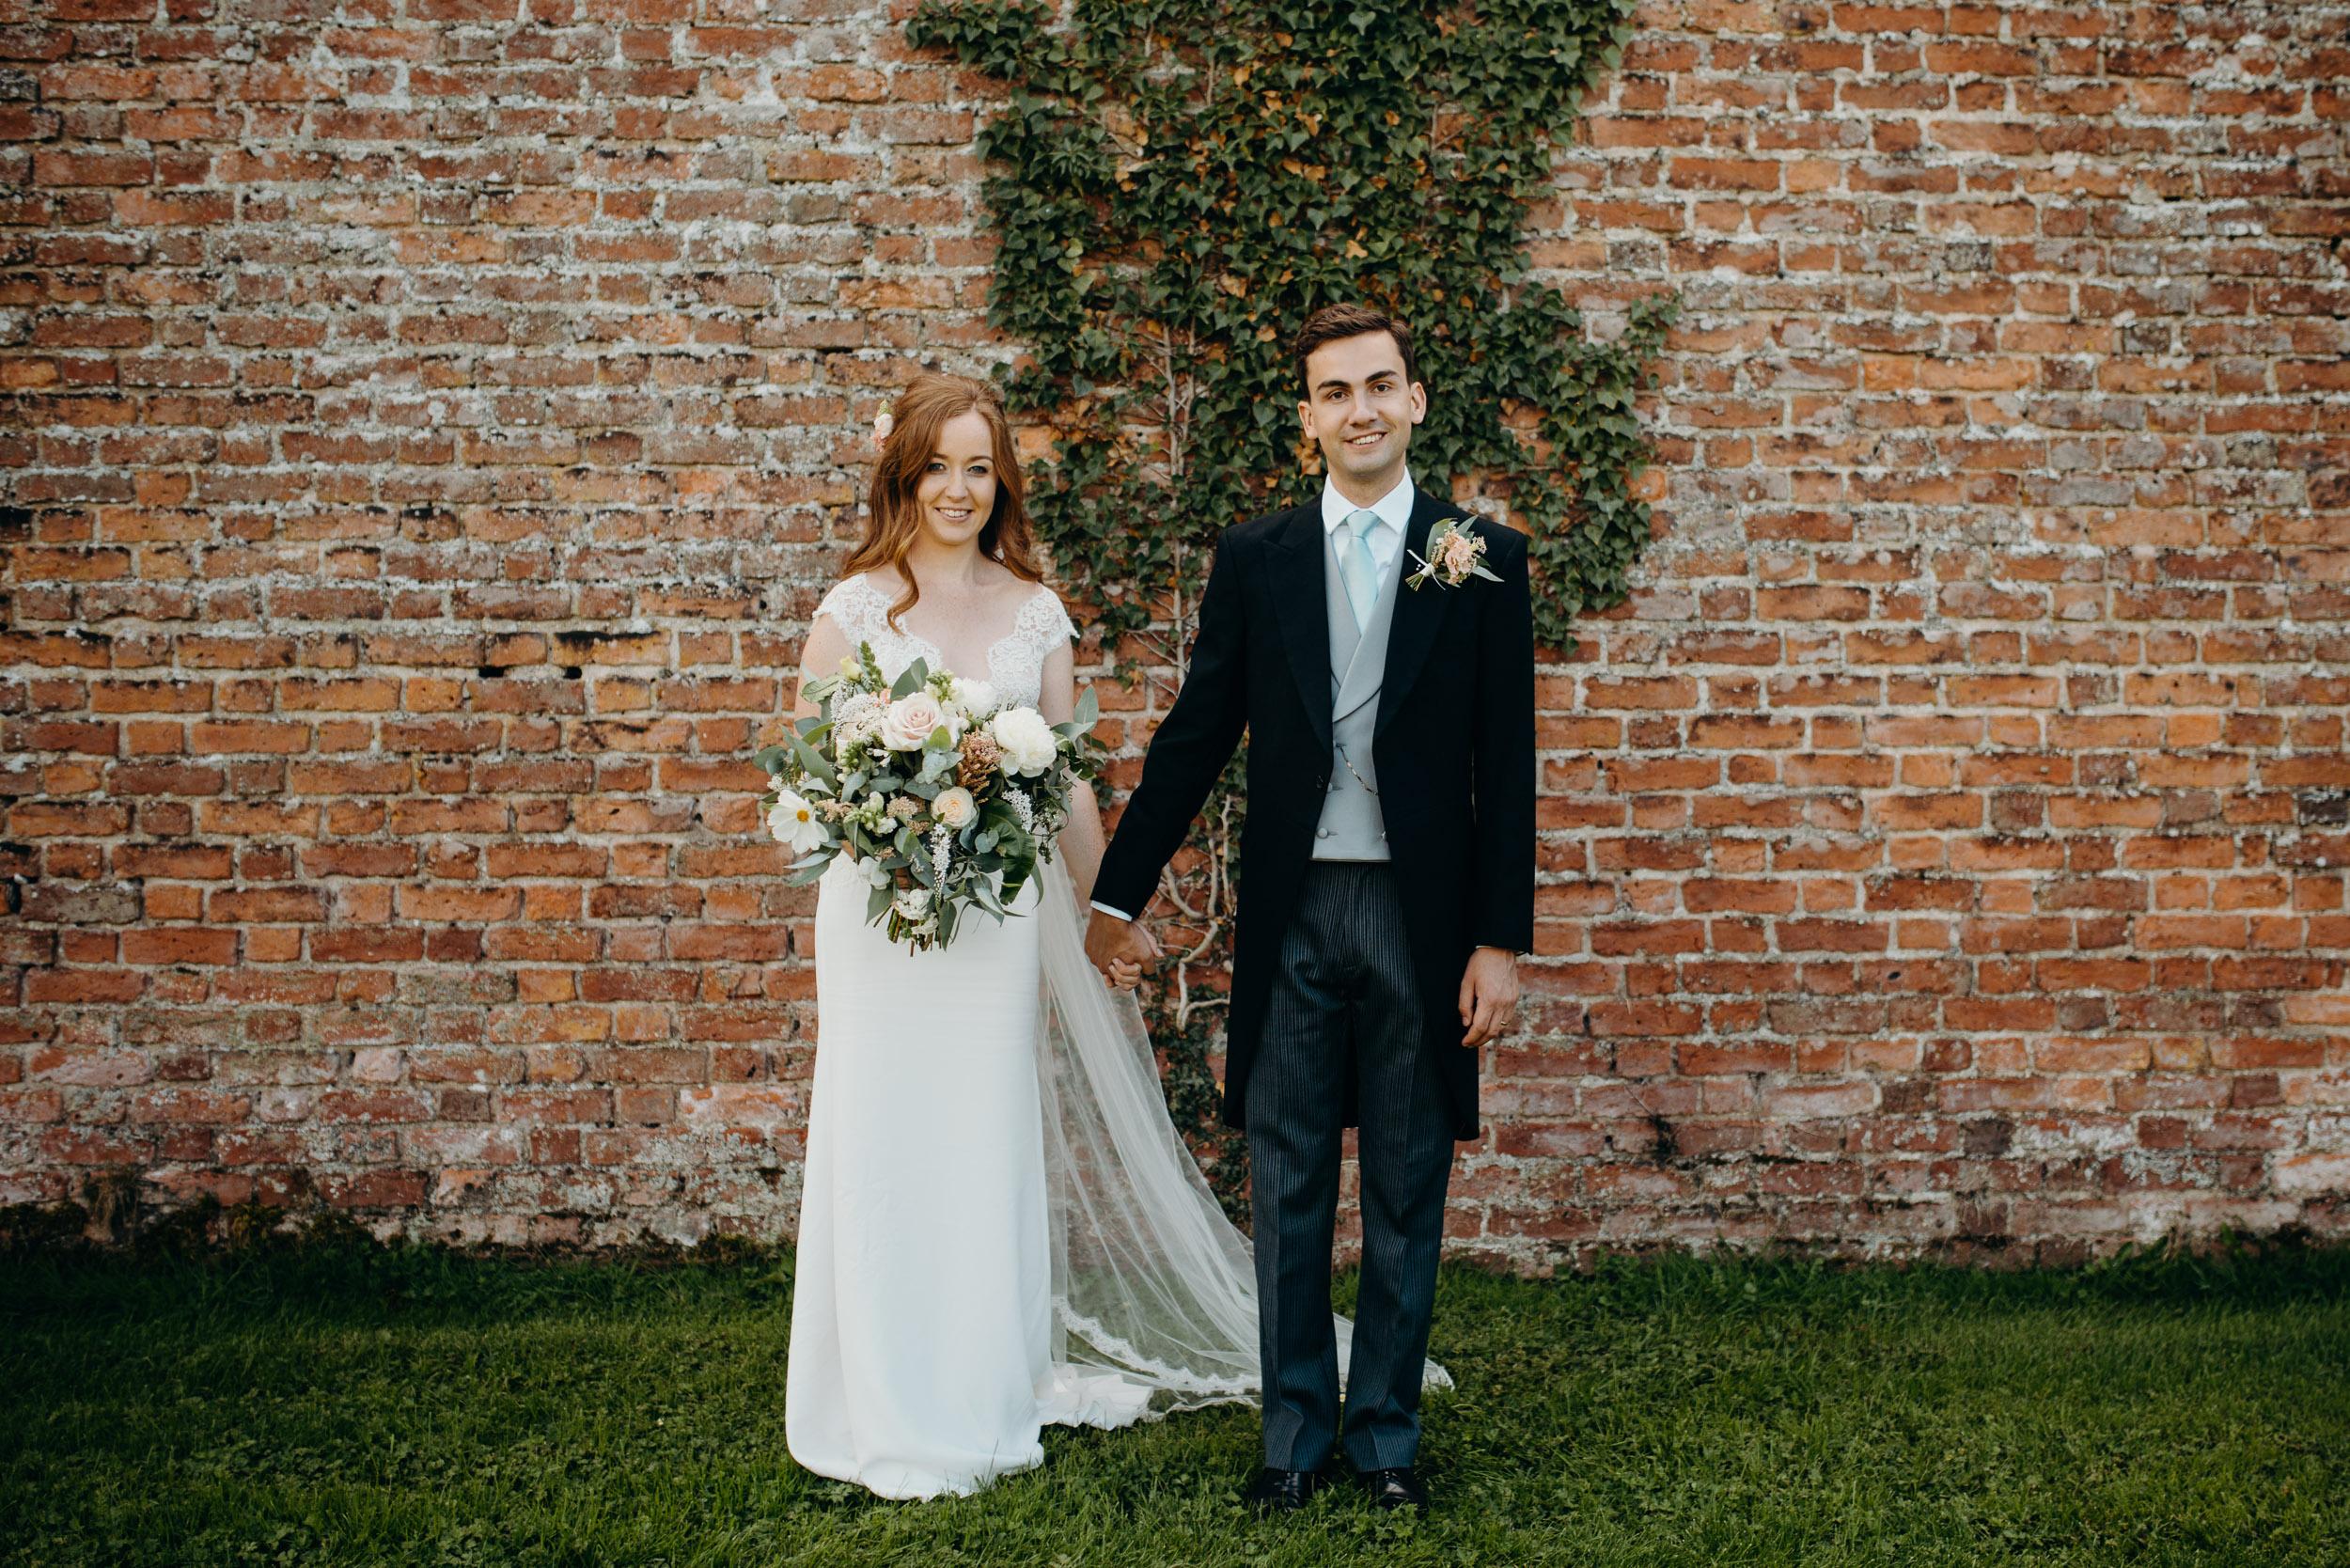 drenagh estate wedding photography-86.jpg